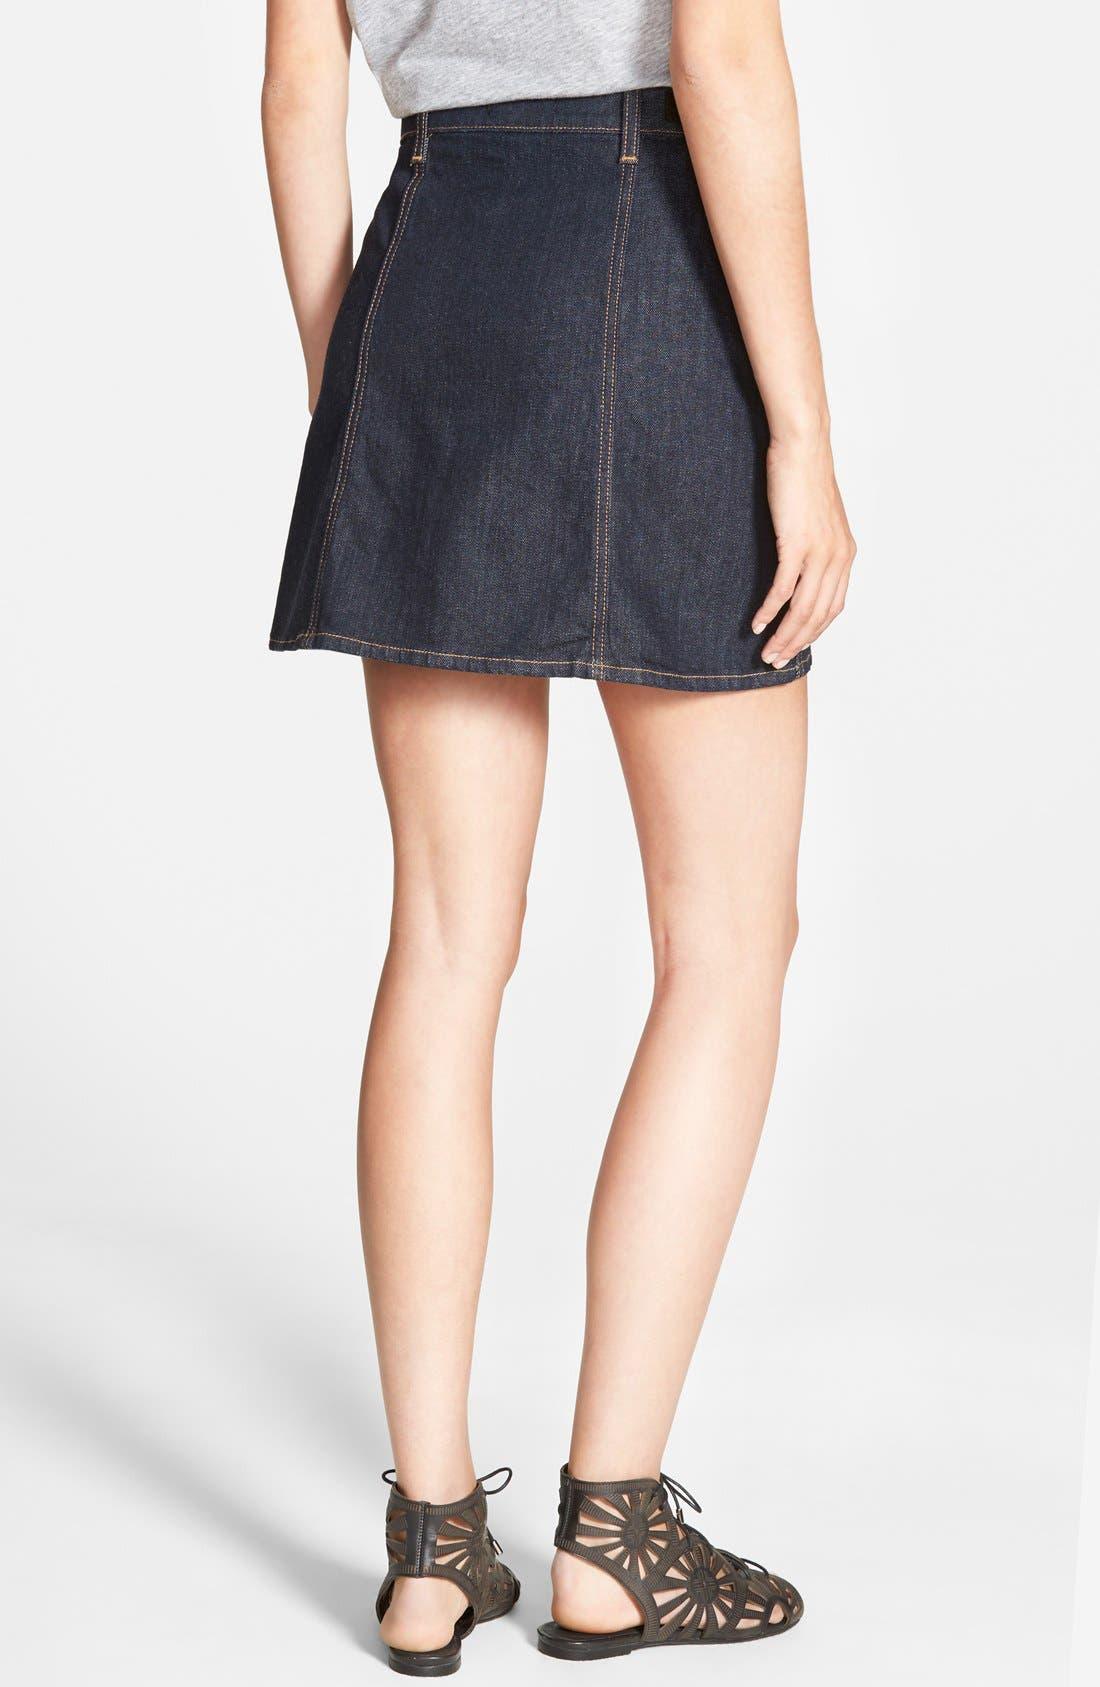 Alternate Image 2  - Alexa Chung for AG 'The Kety' A-Line Denim Skirt (Loan Star)